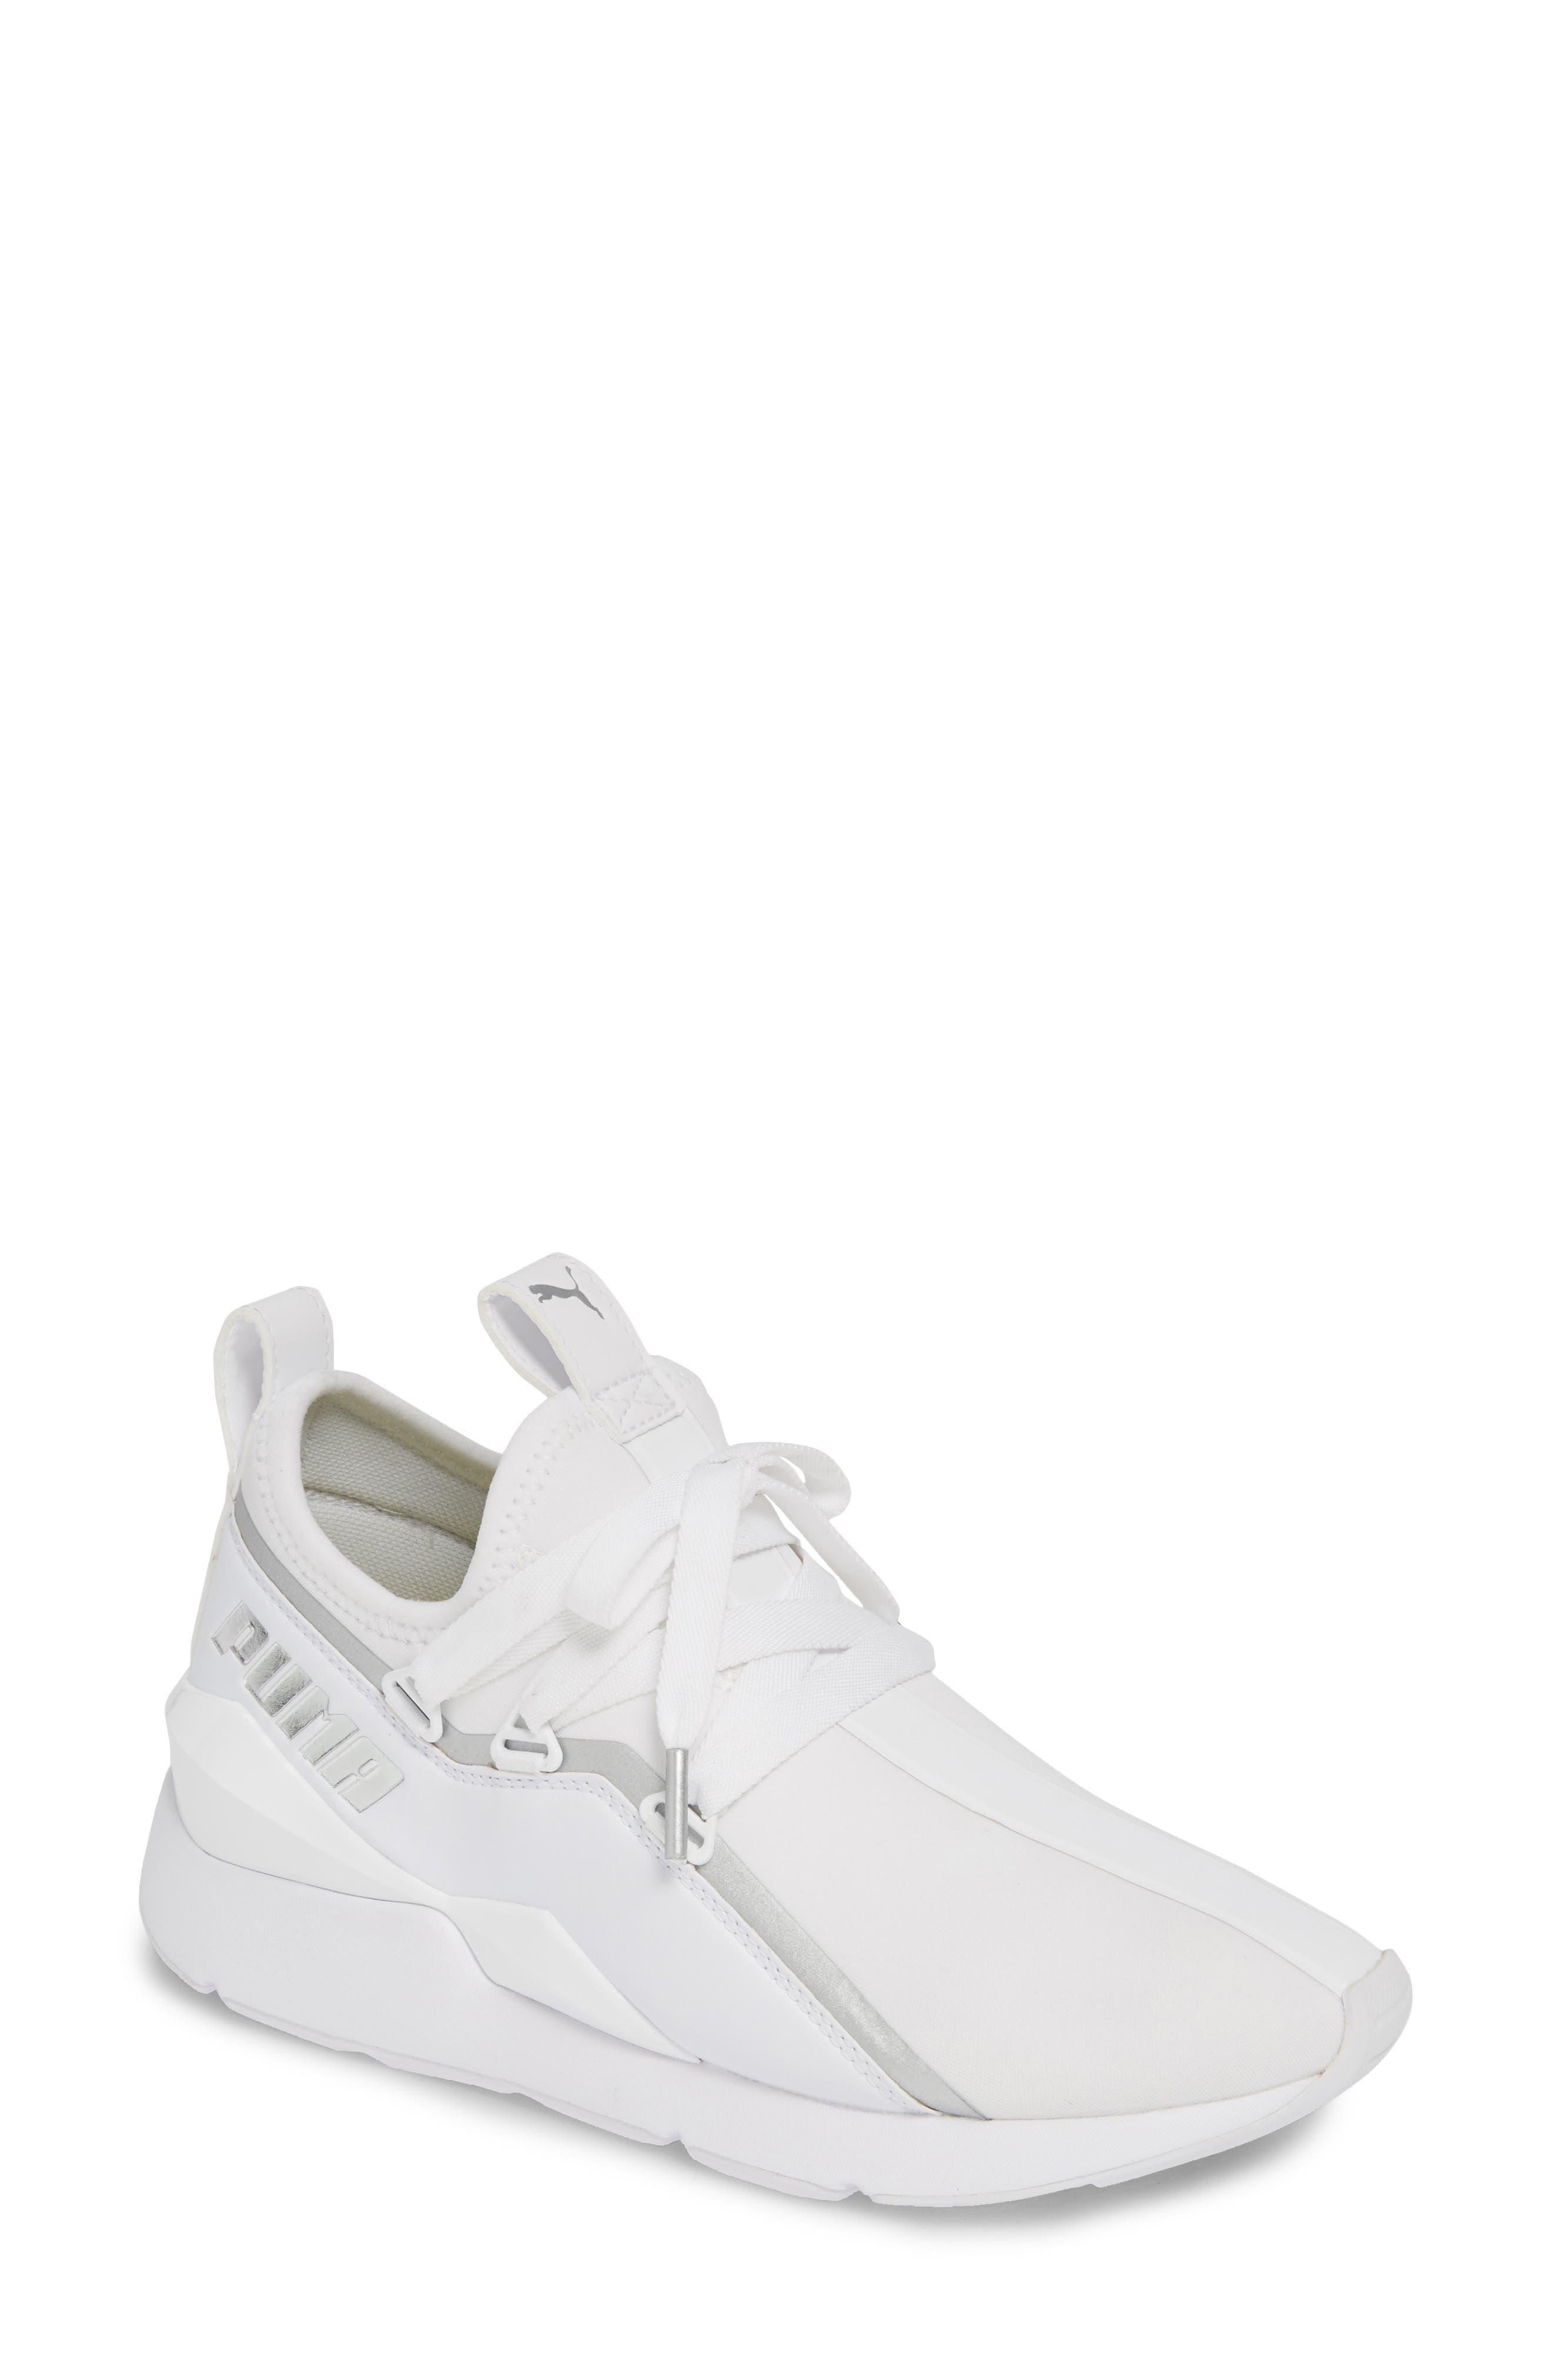 PUMA, Muse 2 Trailblazer Sneaker, Main thumbnail 1, color, WHITE/ SILVER